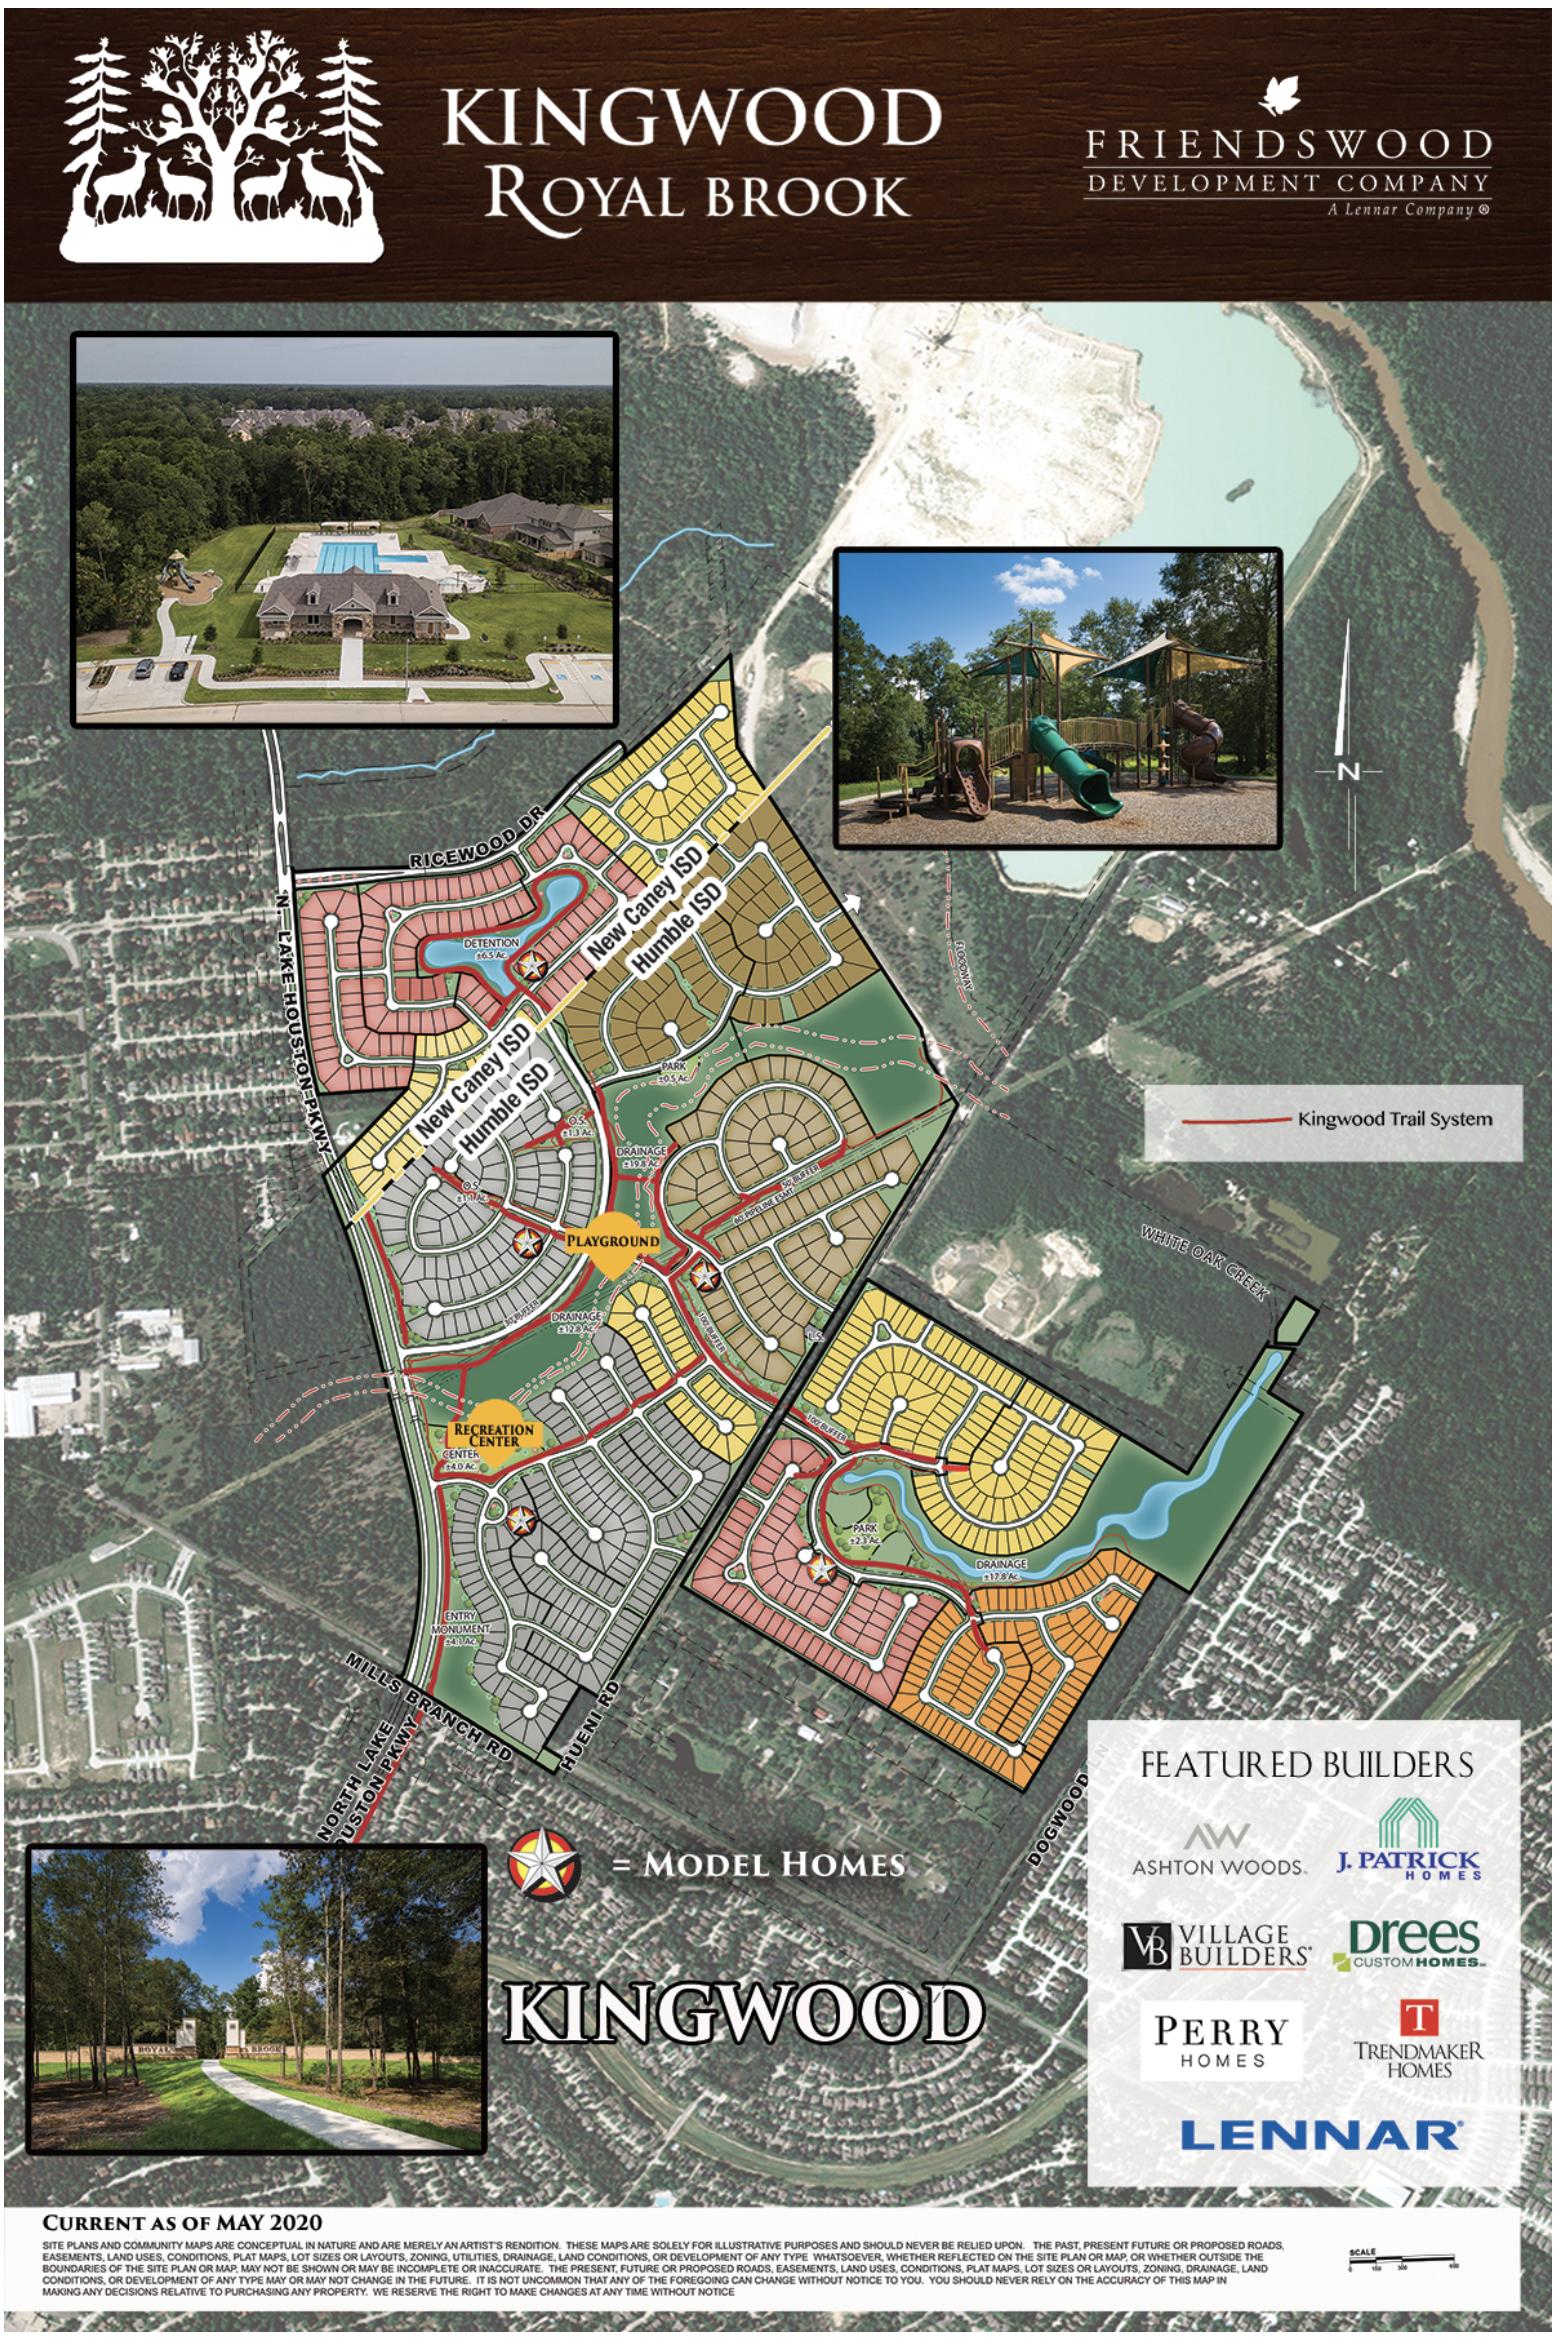 kingwood_royal_brook_master_planned_community